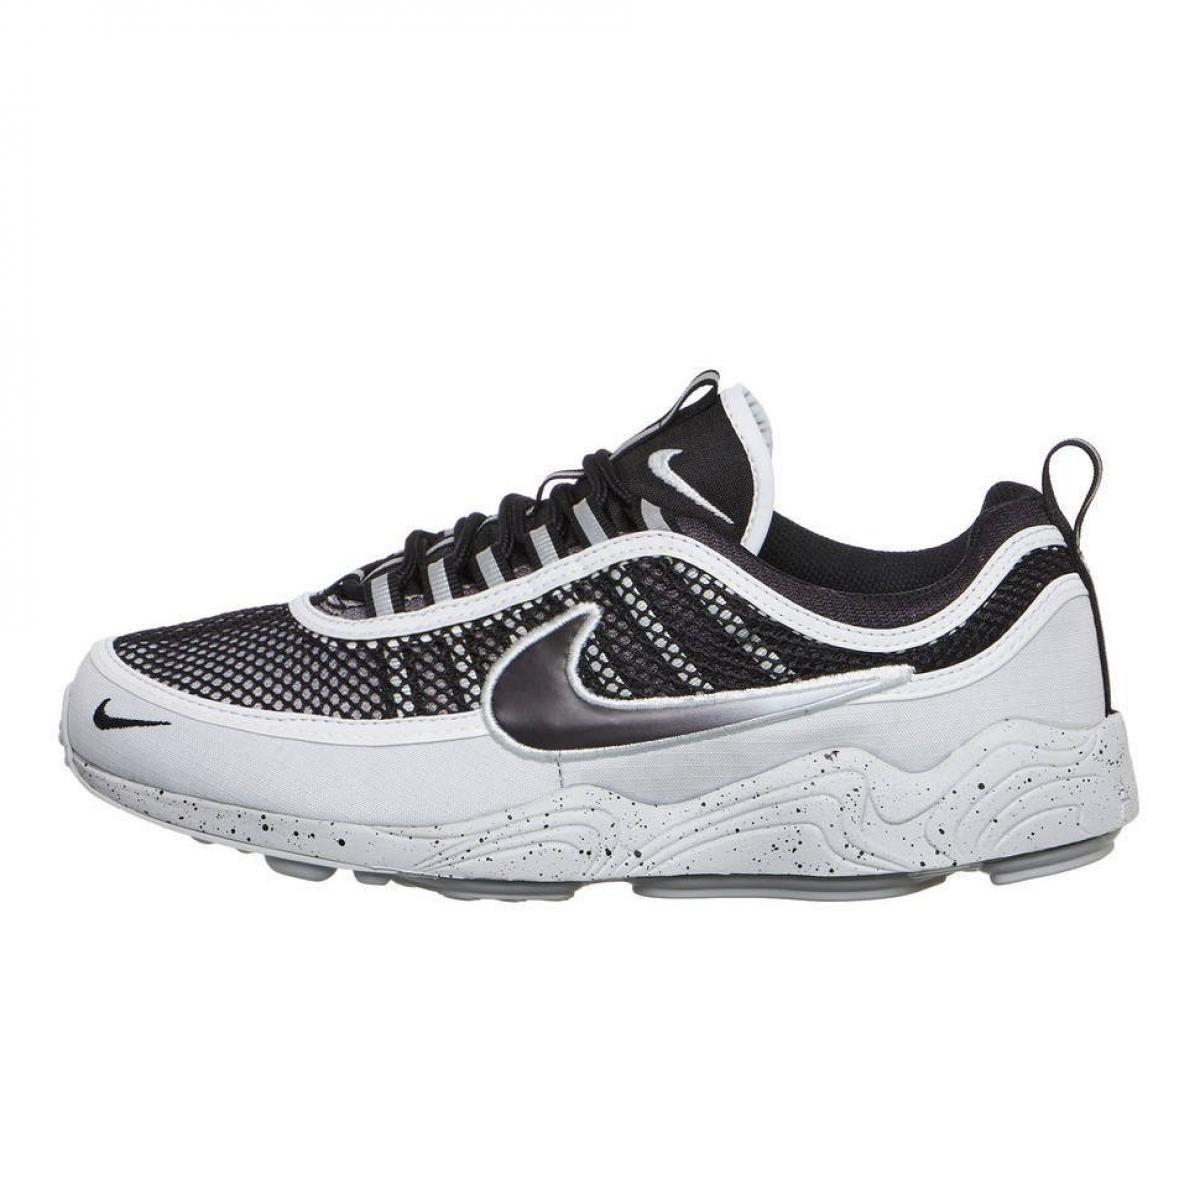 MultiCouleure (Pure Platinum noir- 004) Nike Air Zoom Spiridon '16, Chaussures de Running Compétition Homme 45.5 EU